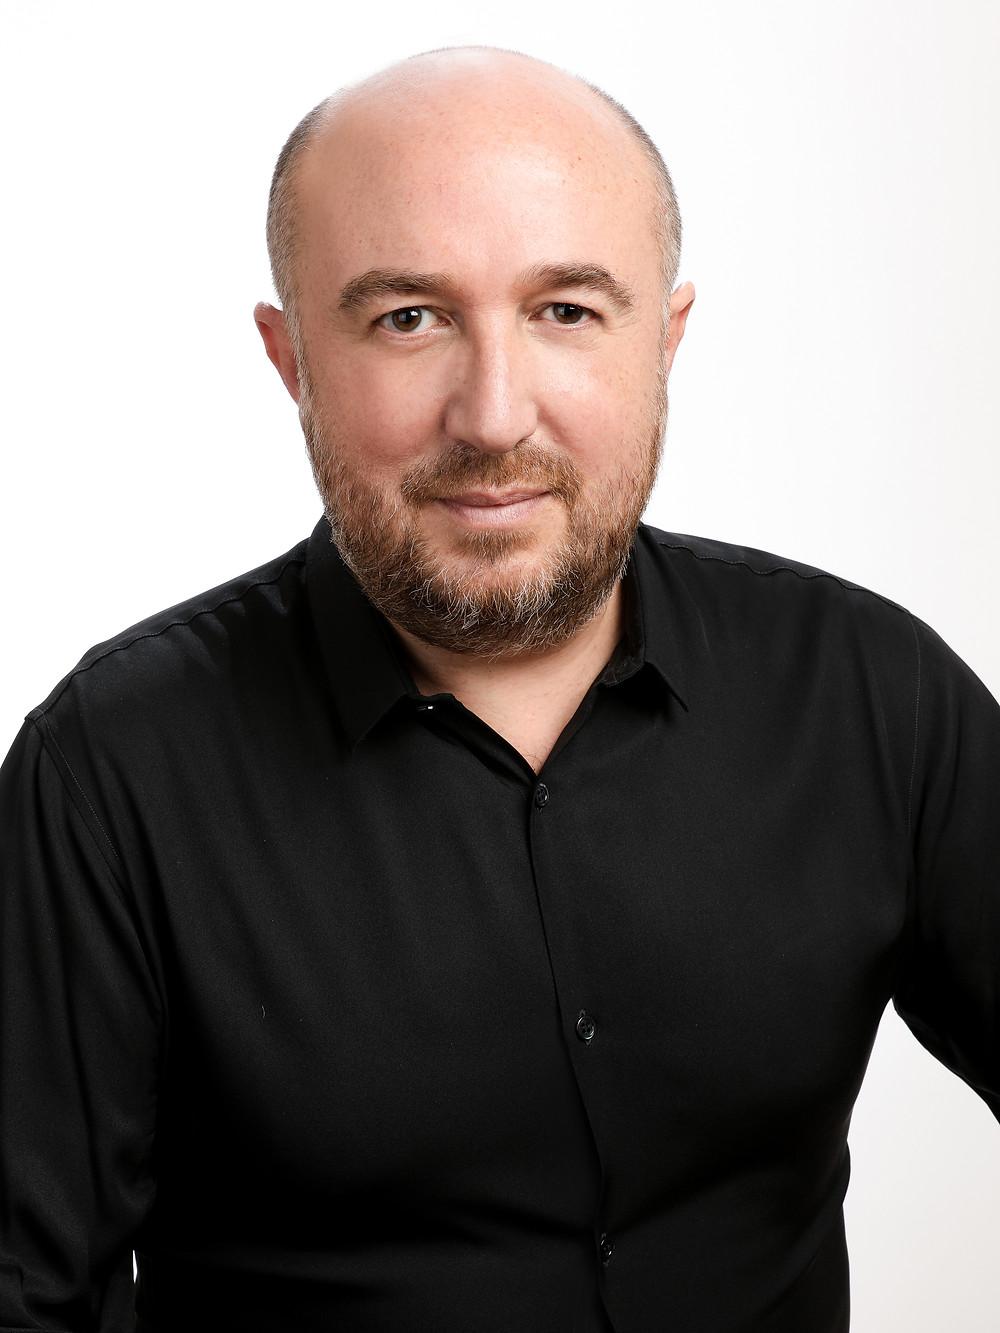 Photo by François Goize